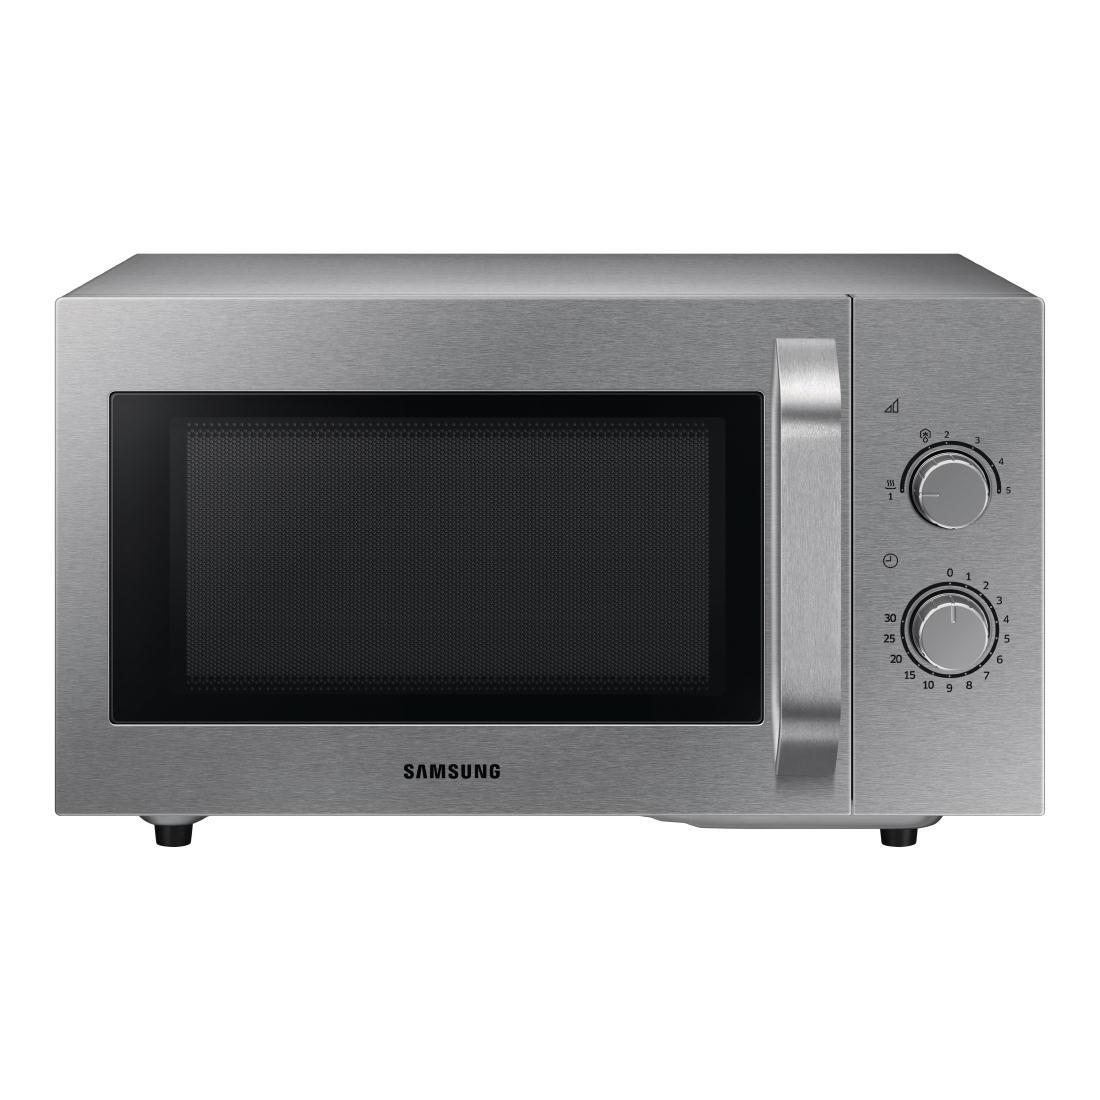 Samsung Microwave Oven CM1119